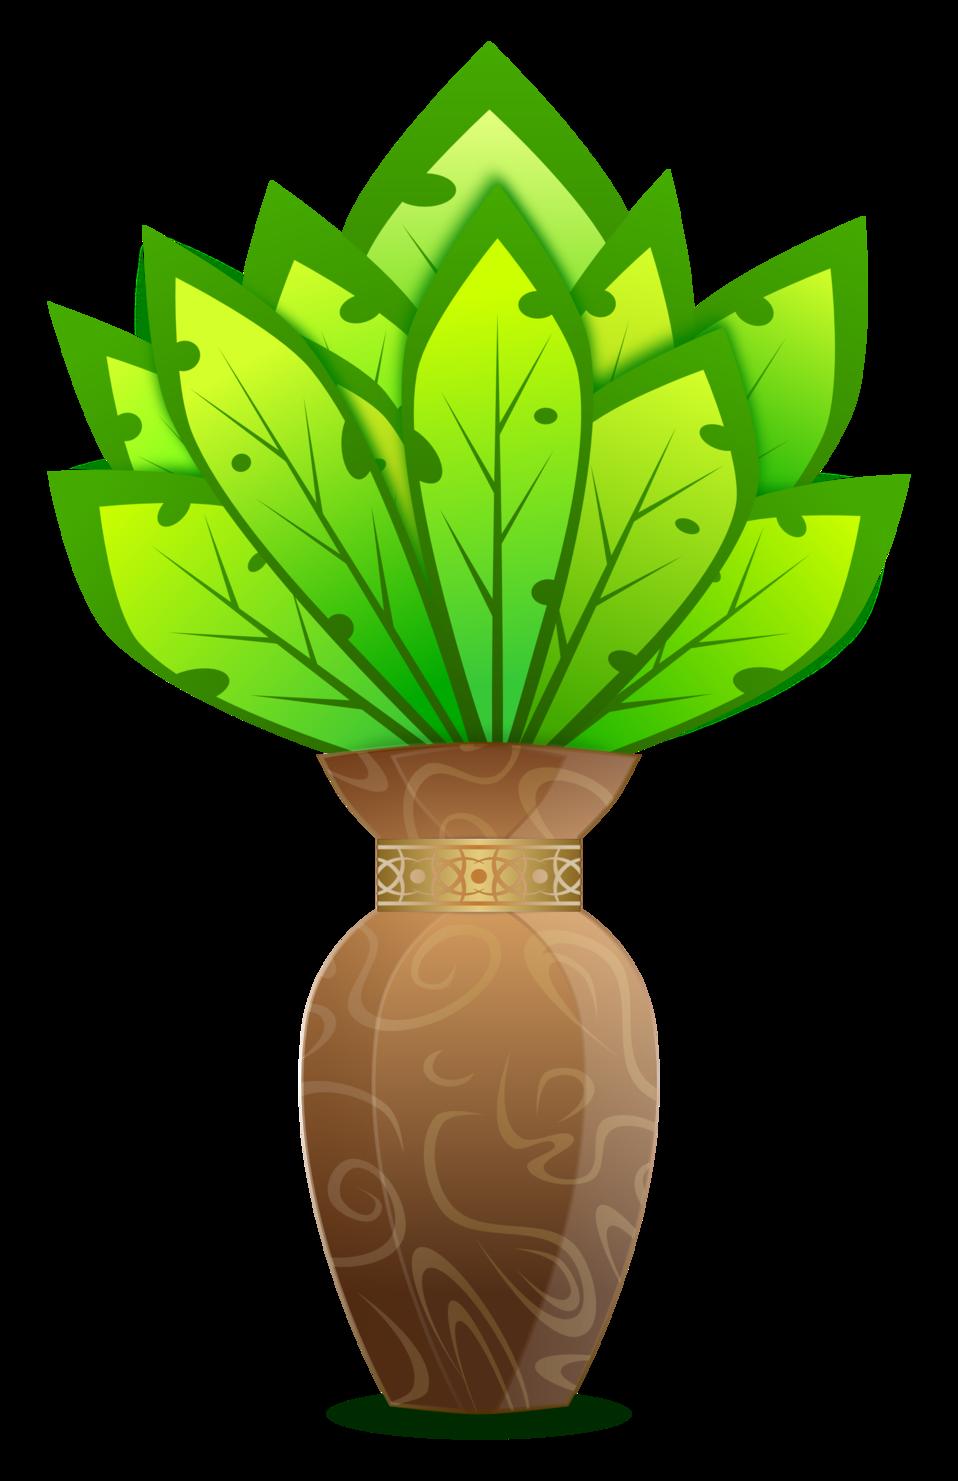 Plant And Vase / Planter